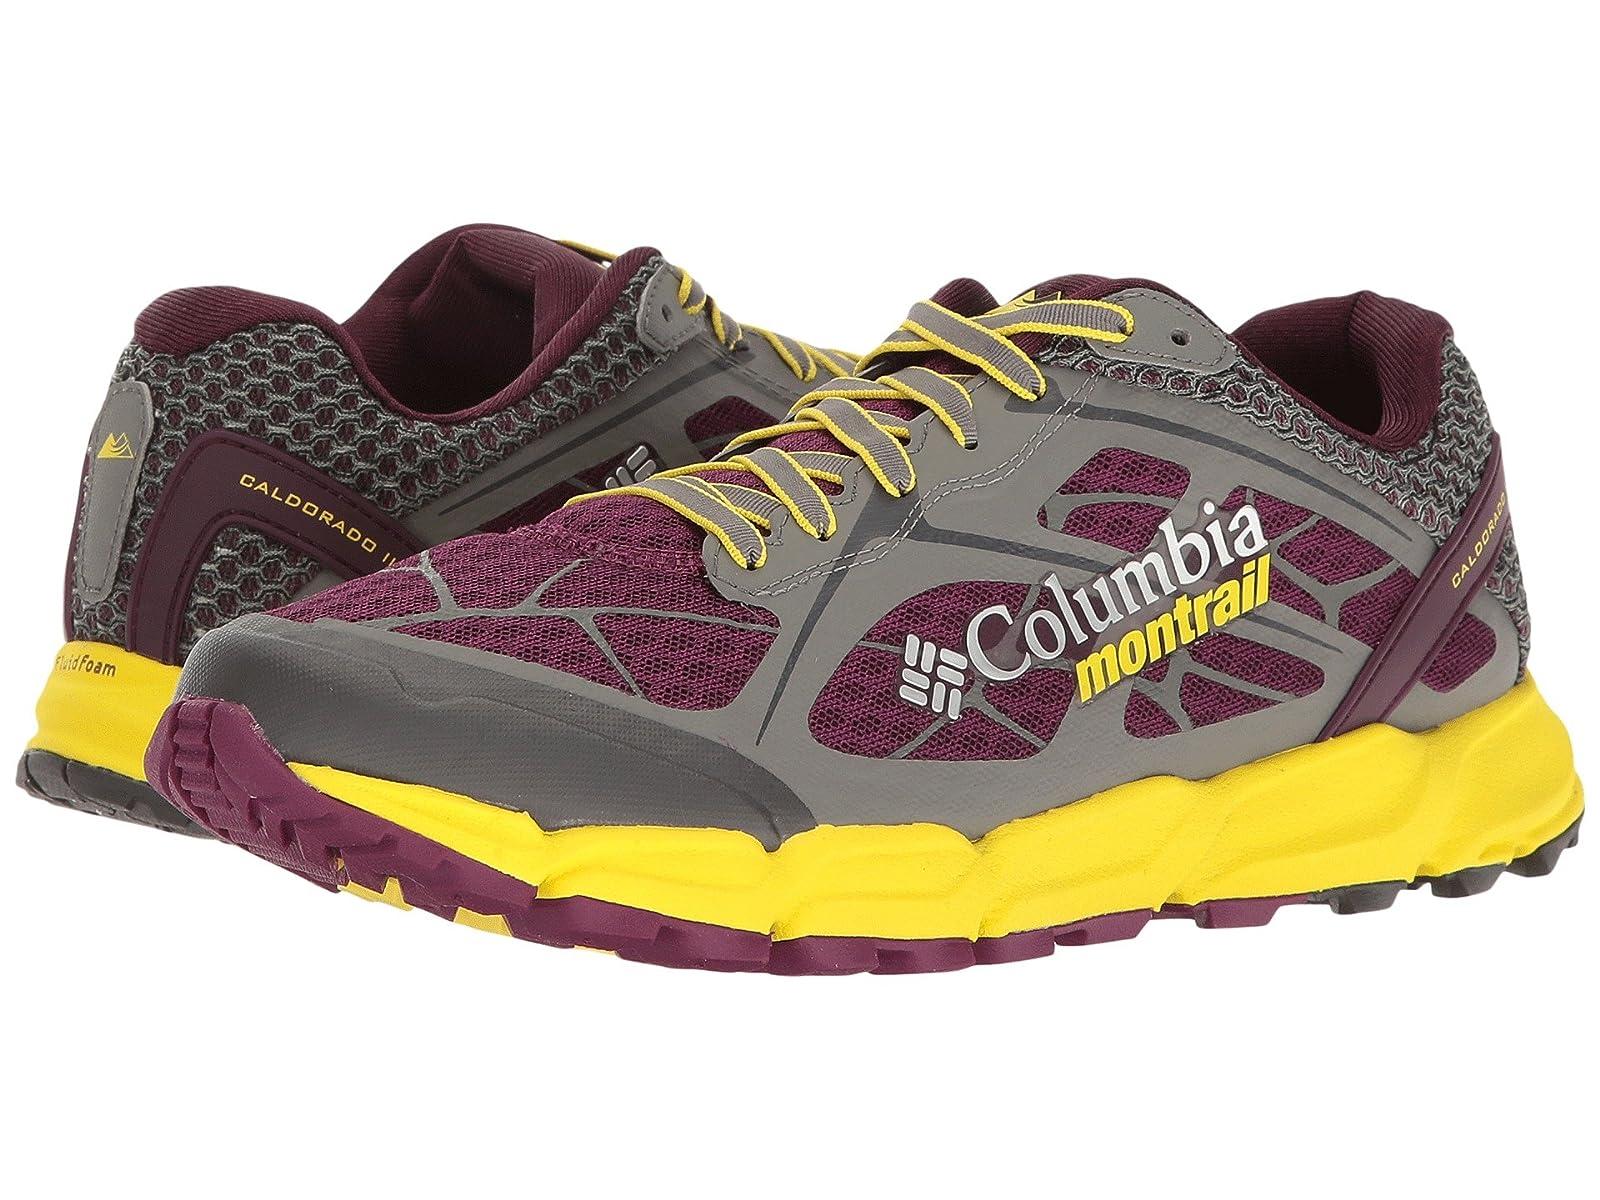 Columbia Caldorado IICheap and distinctive eye-catching shoes